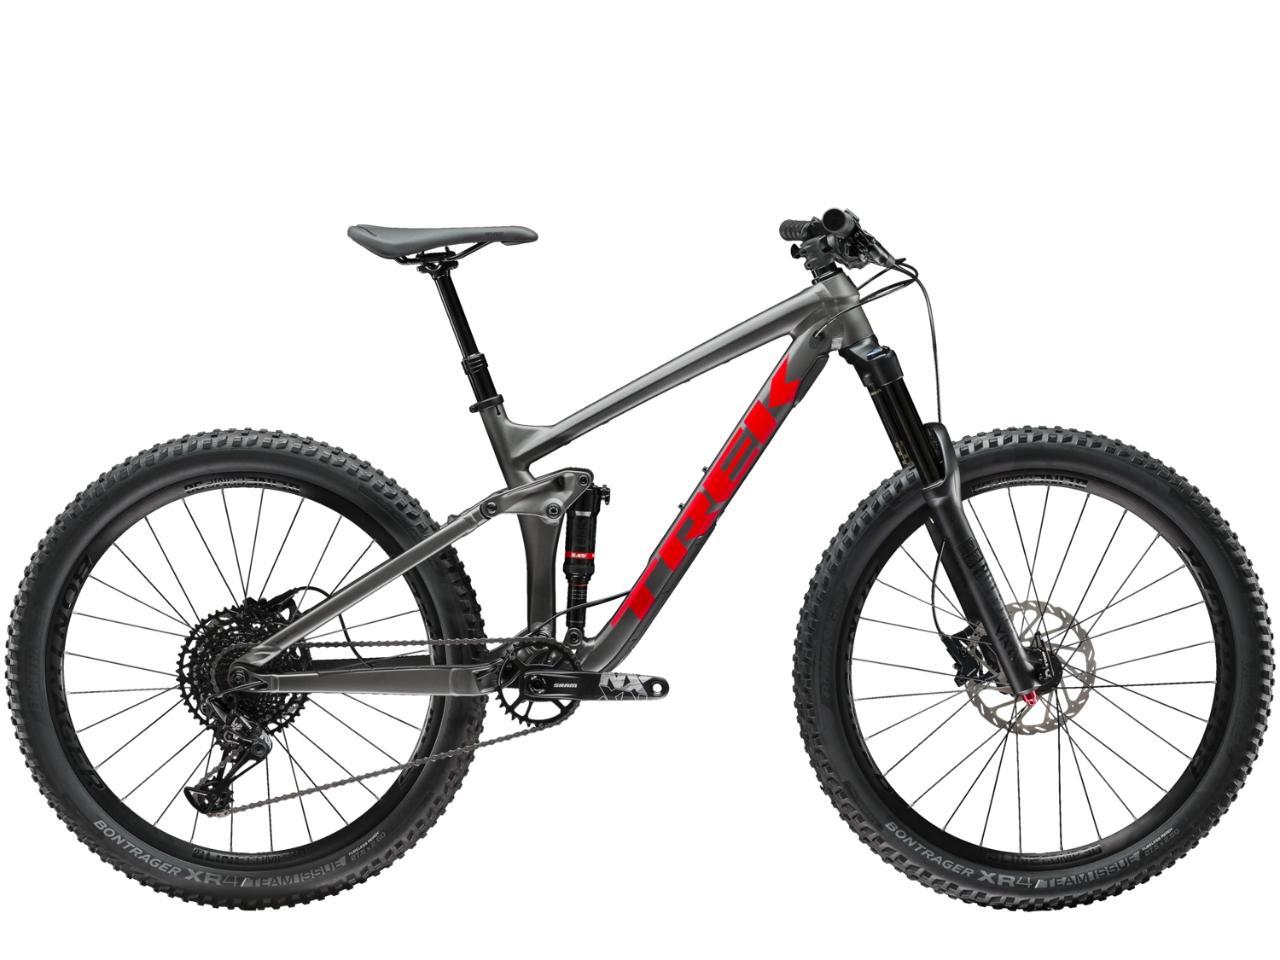 MT BULLER | Dual Suspension Mountain Bike - Medium